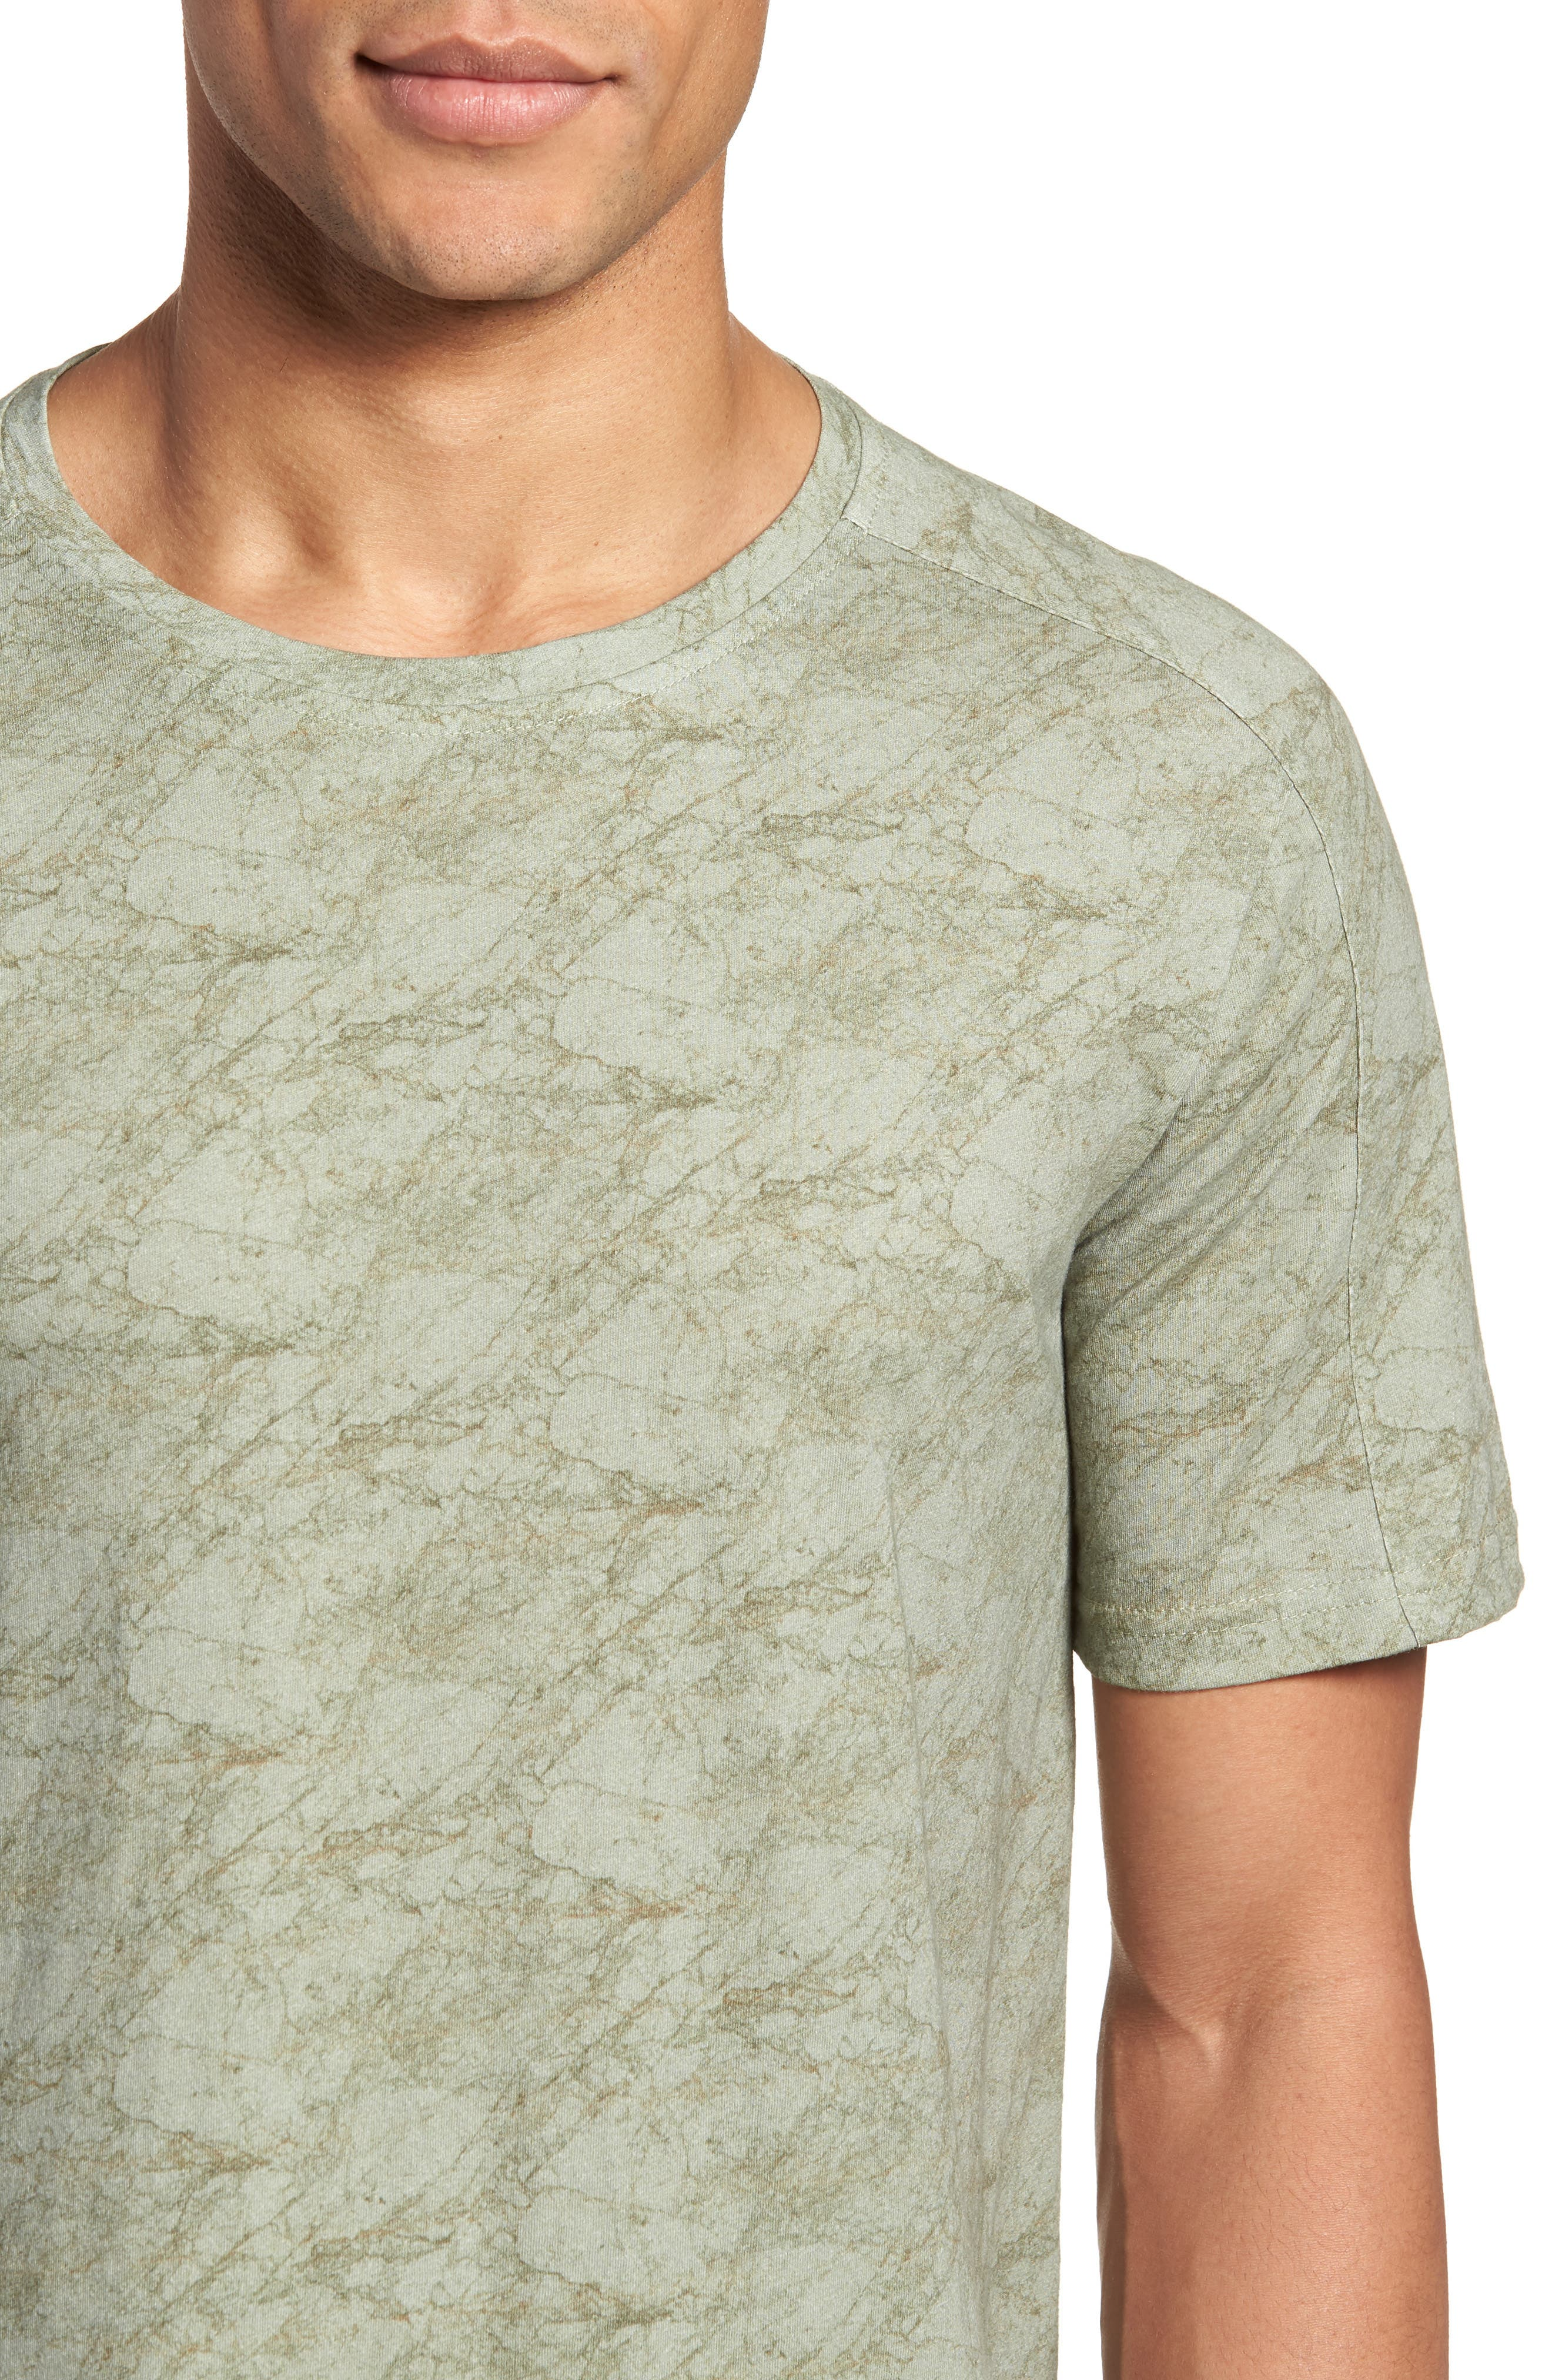 Chelsea Marble Print T-Shirt,                             Alternate thumbnail 4, color,